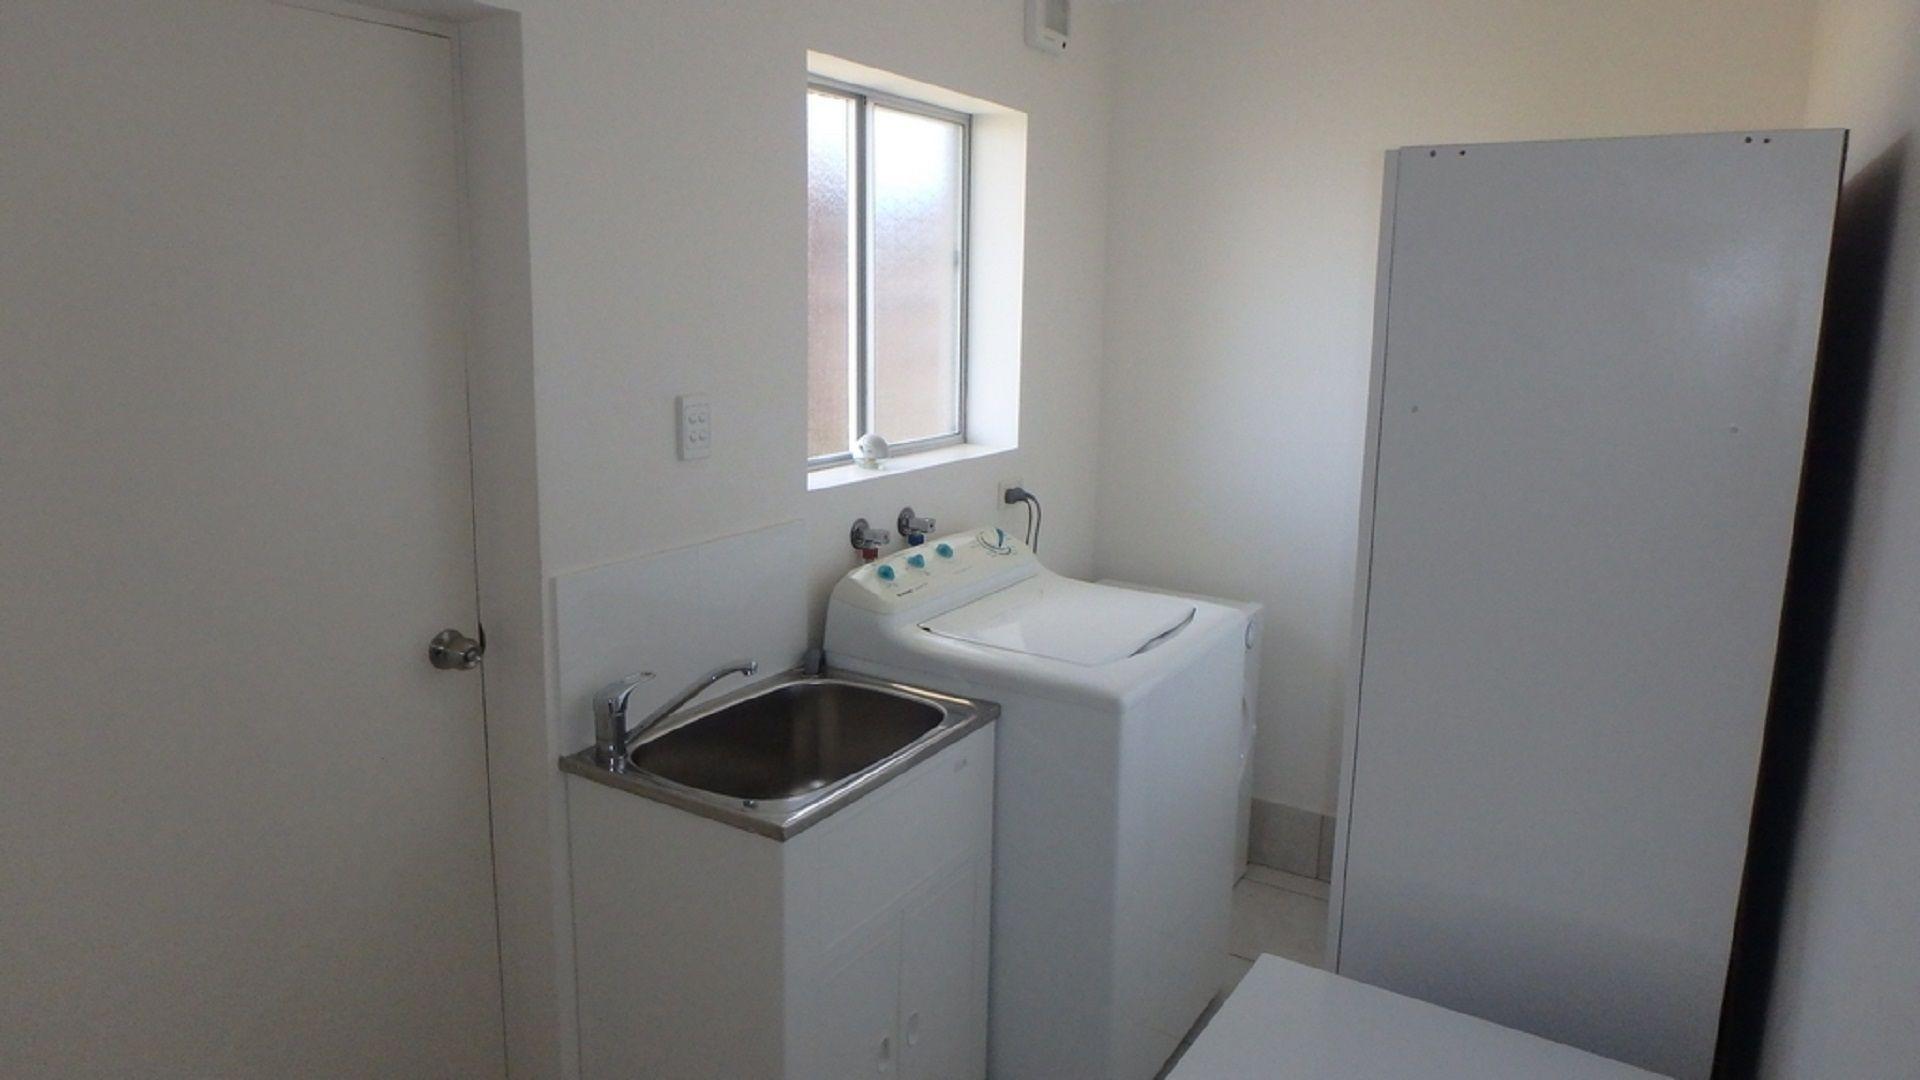 2/61 Beech Street, Evans Head NSW 2473, Image 2